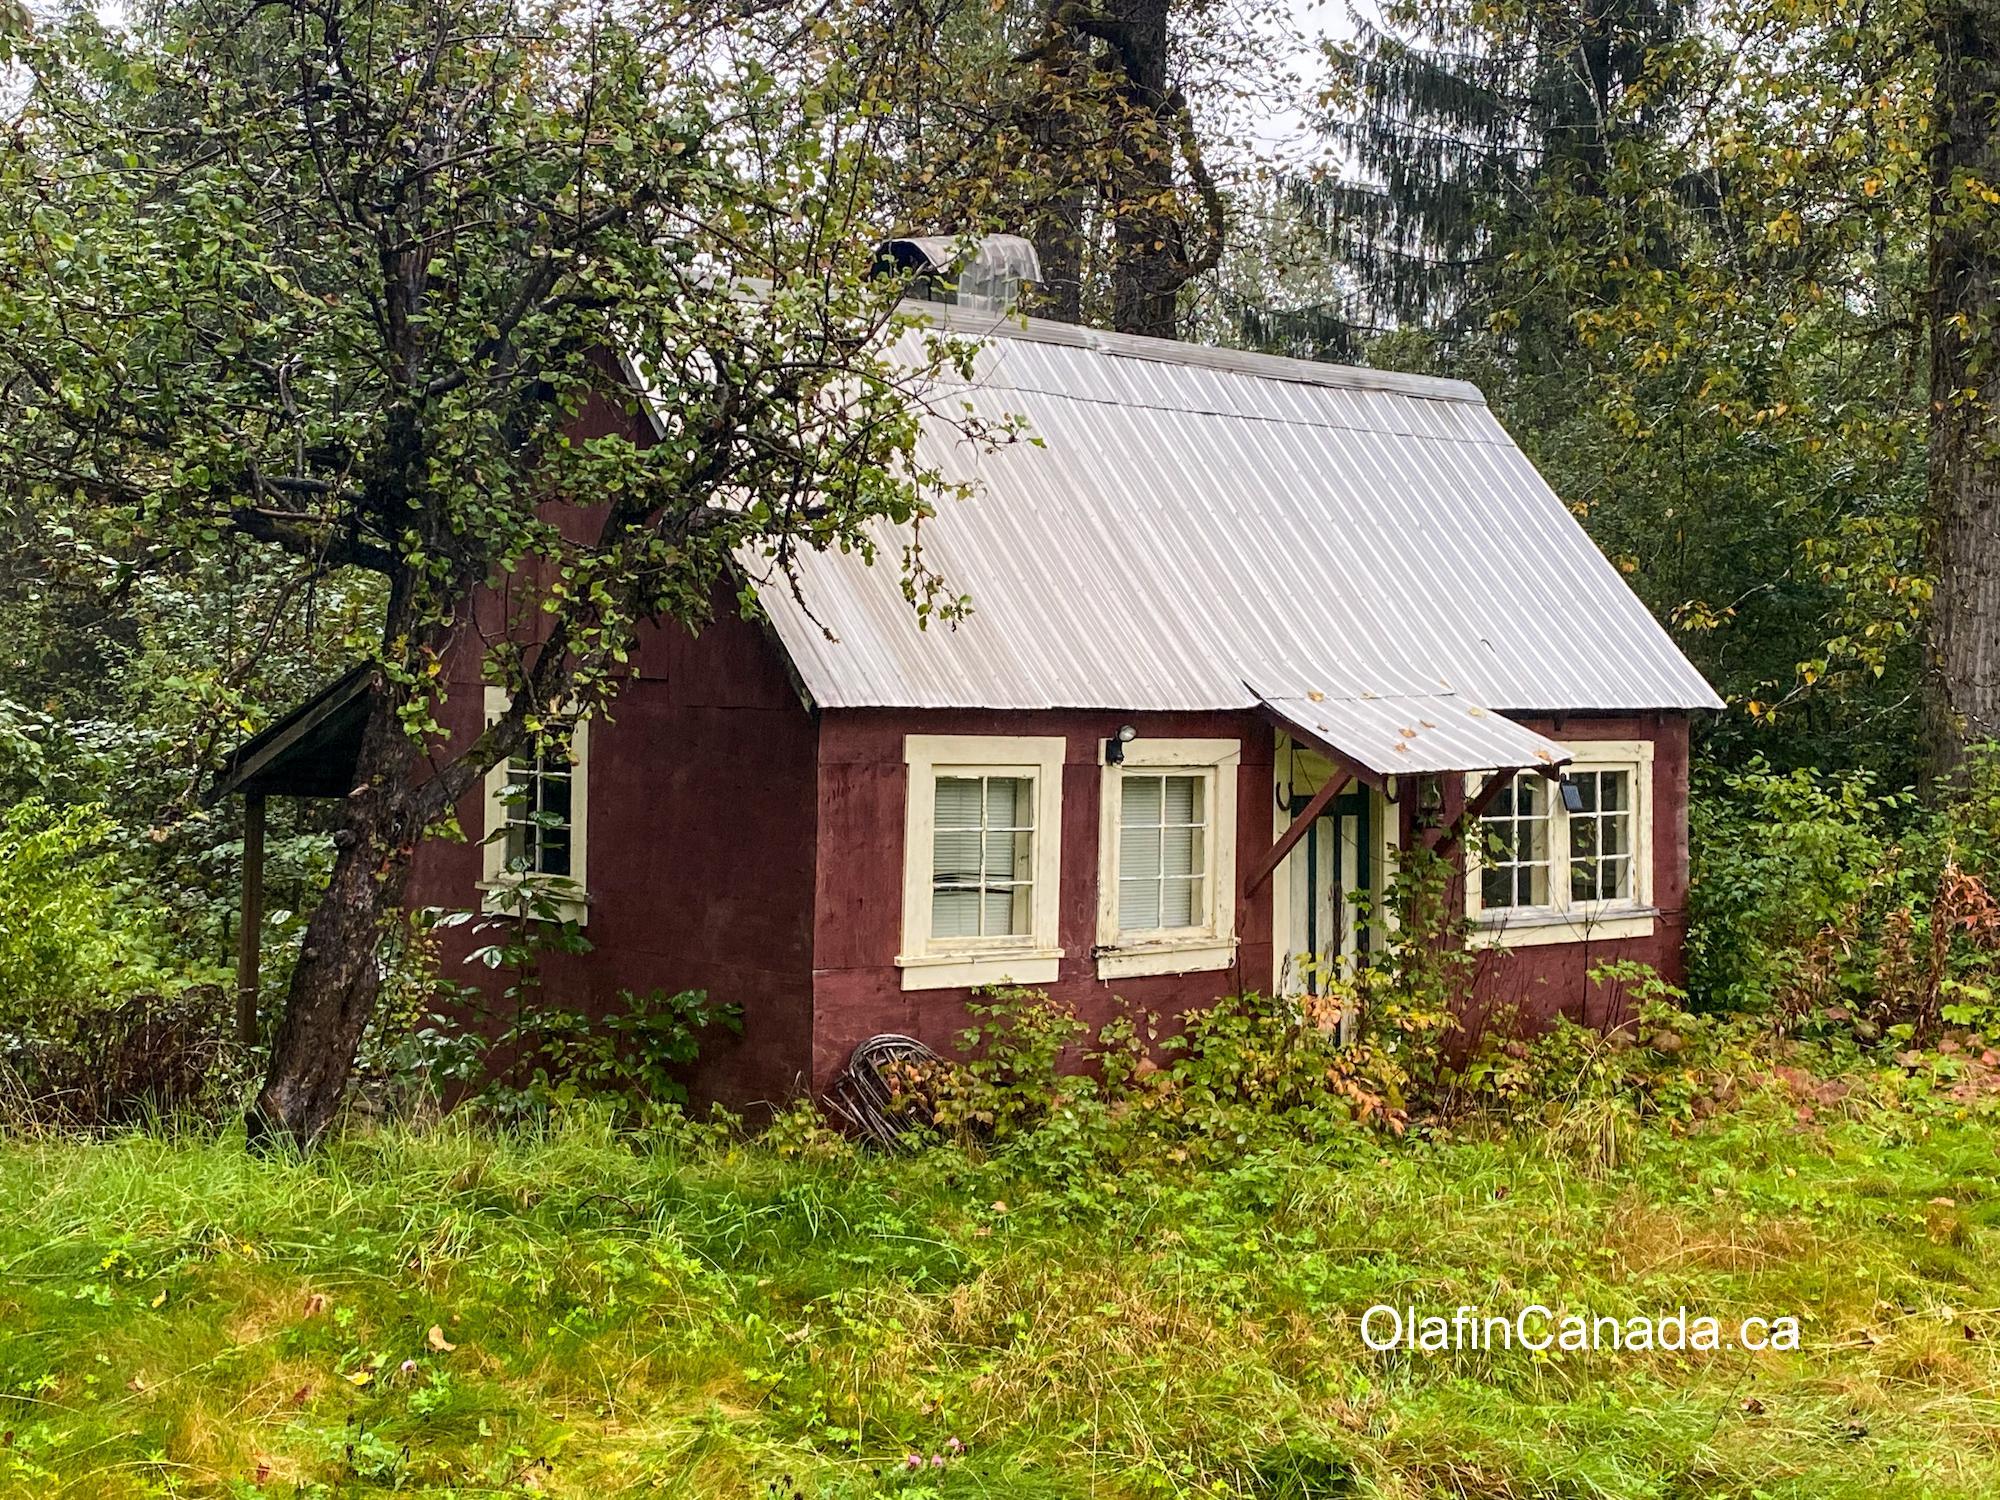 Nice little cottage in Alice Arm. #olafincanada #britishcolumbia #discoverbc #abandonedbc #alicearm